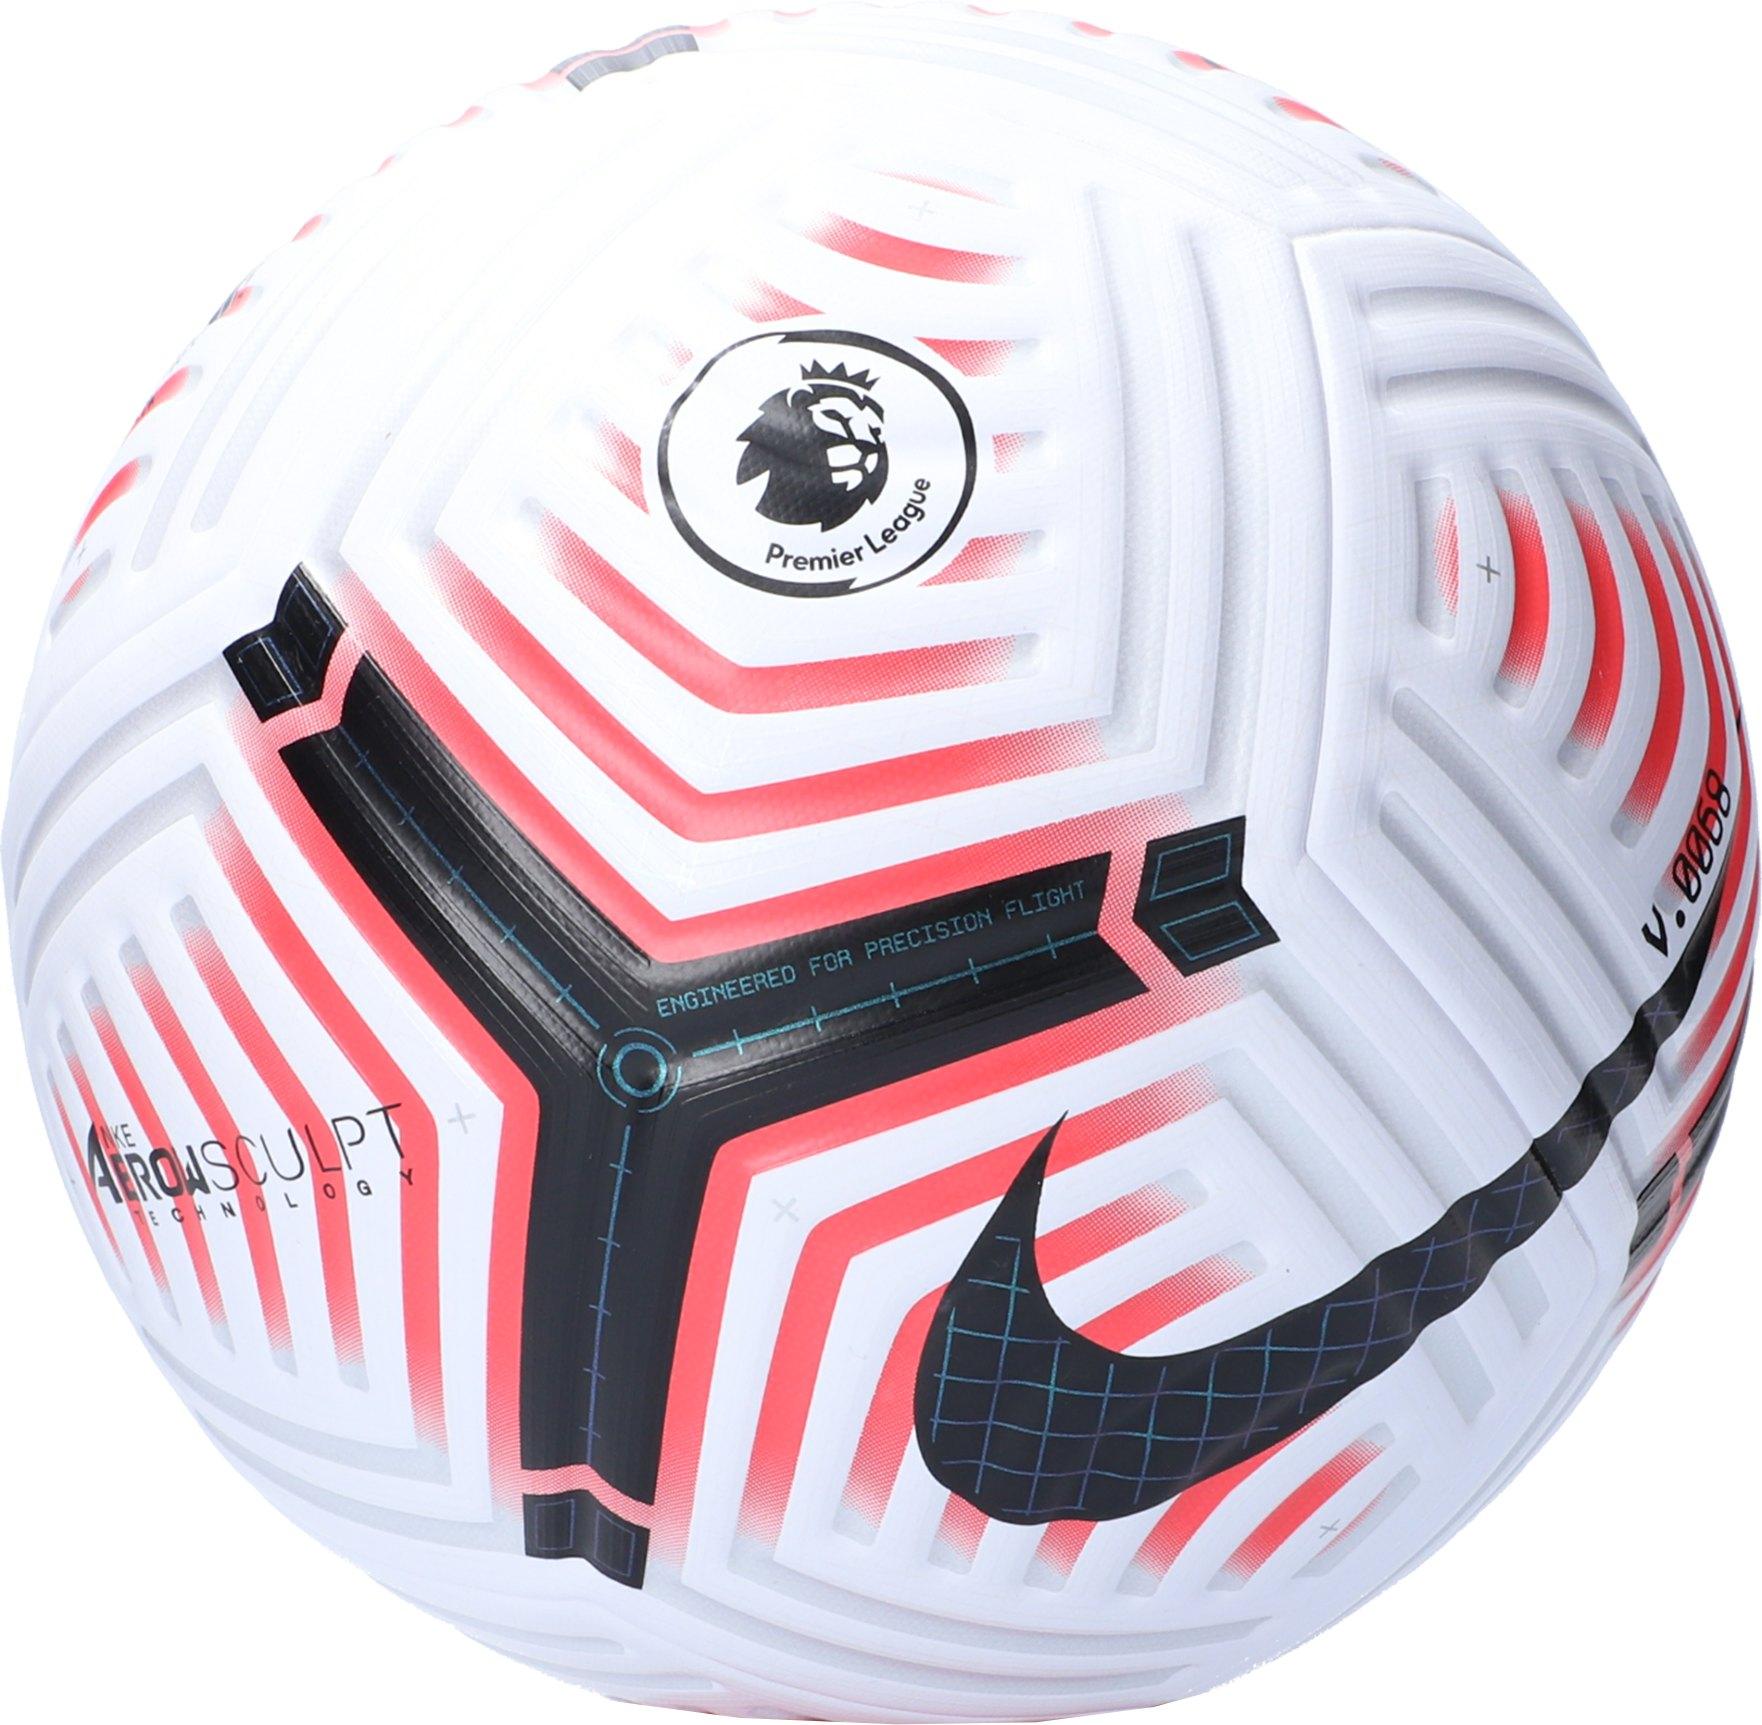 Nike Premier League Flight Spielball Weiss F100 - weiss